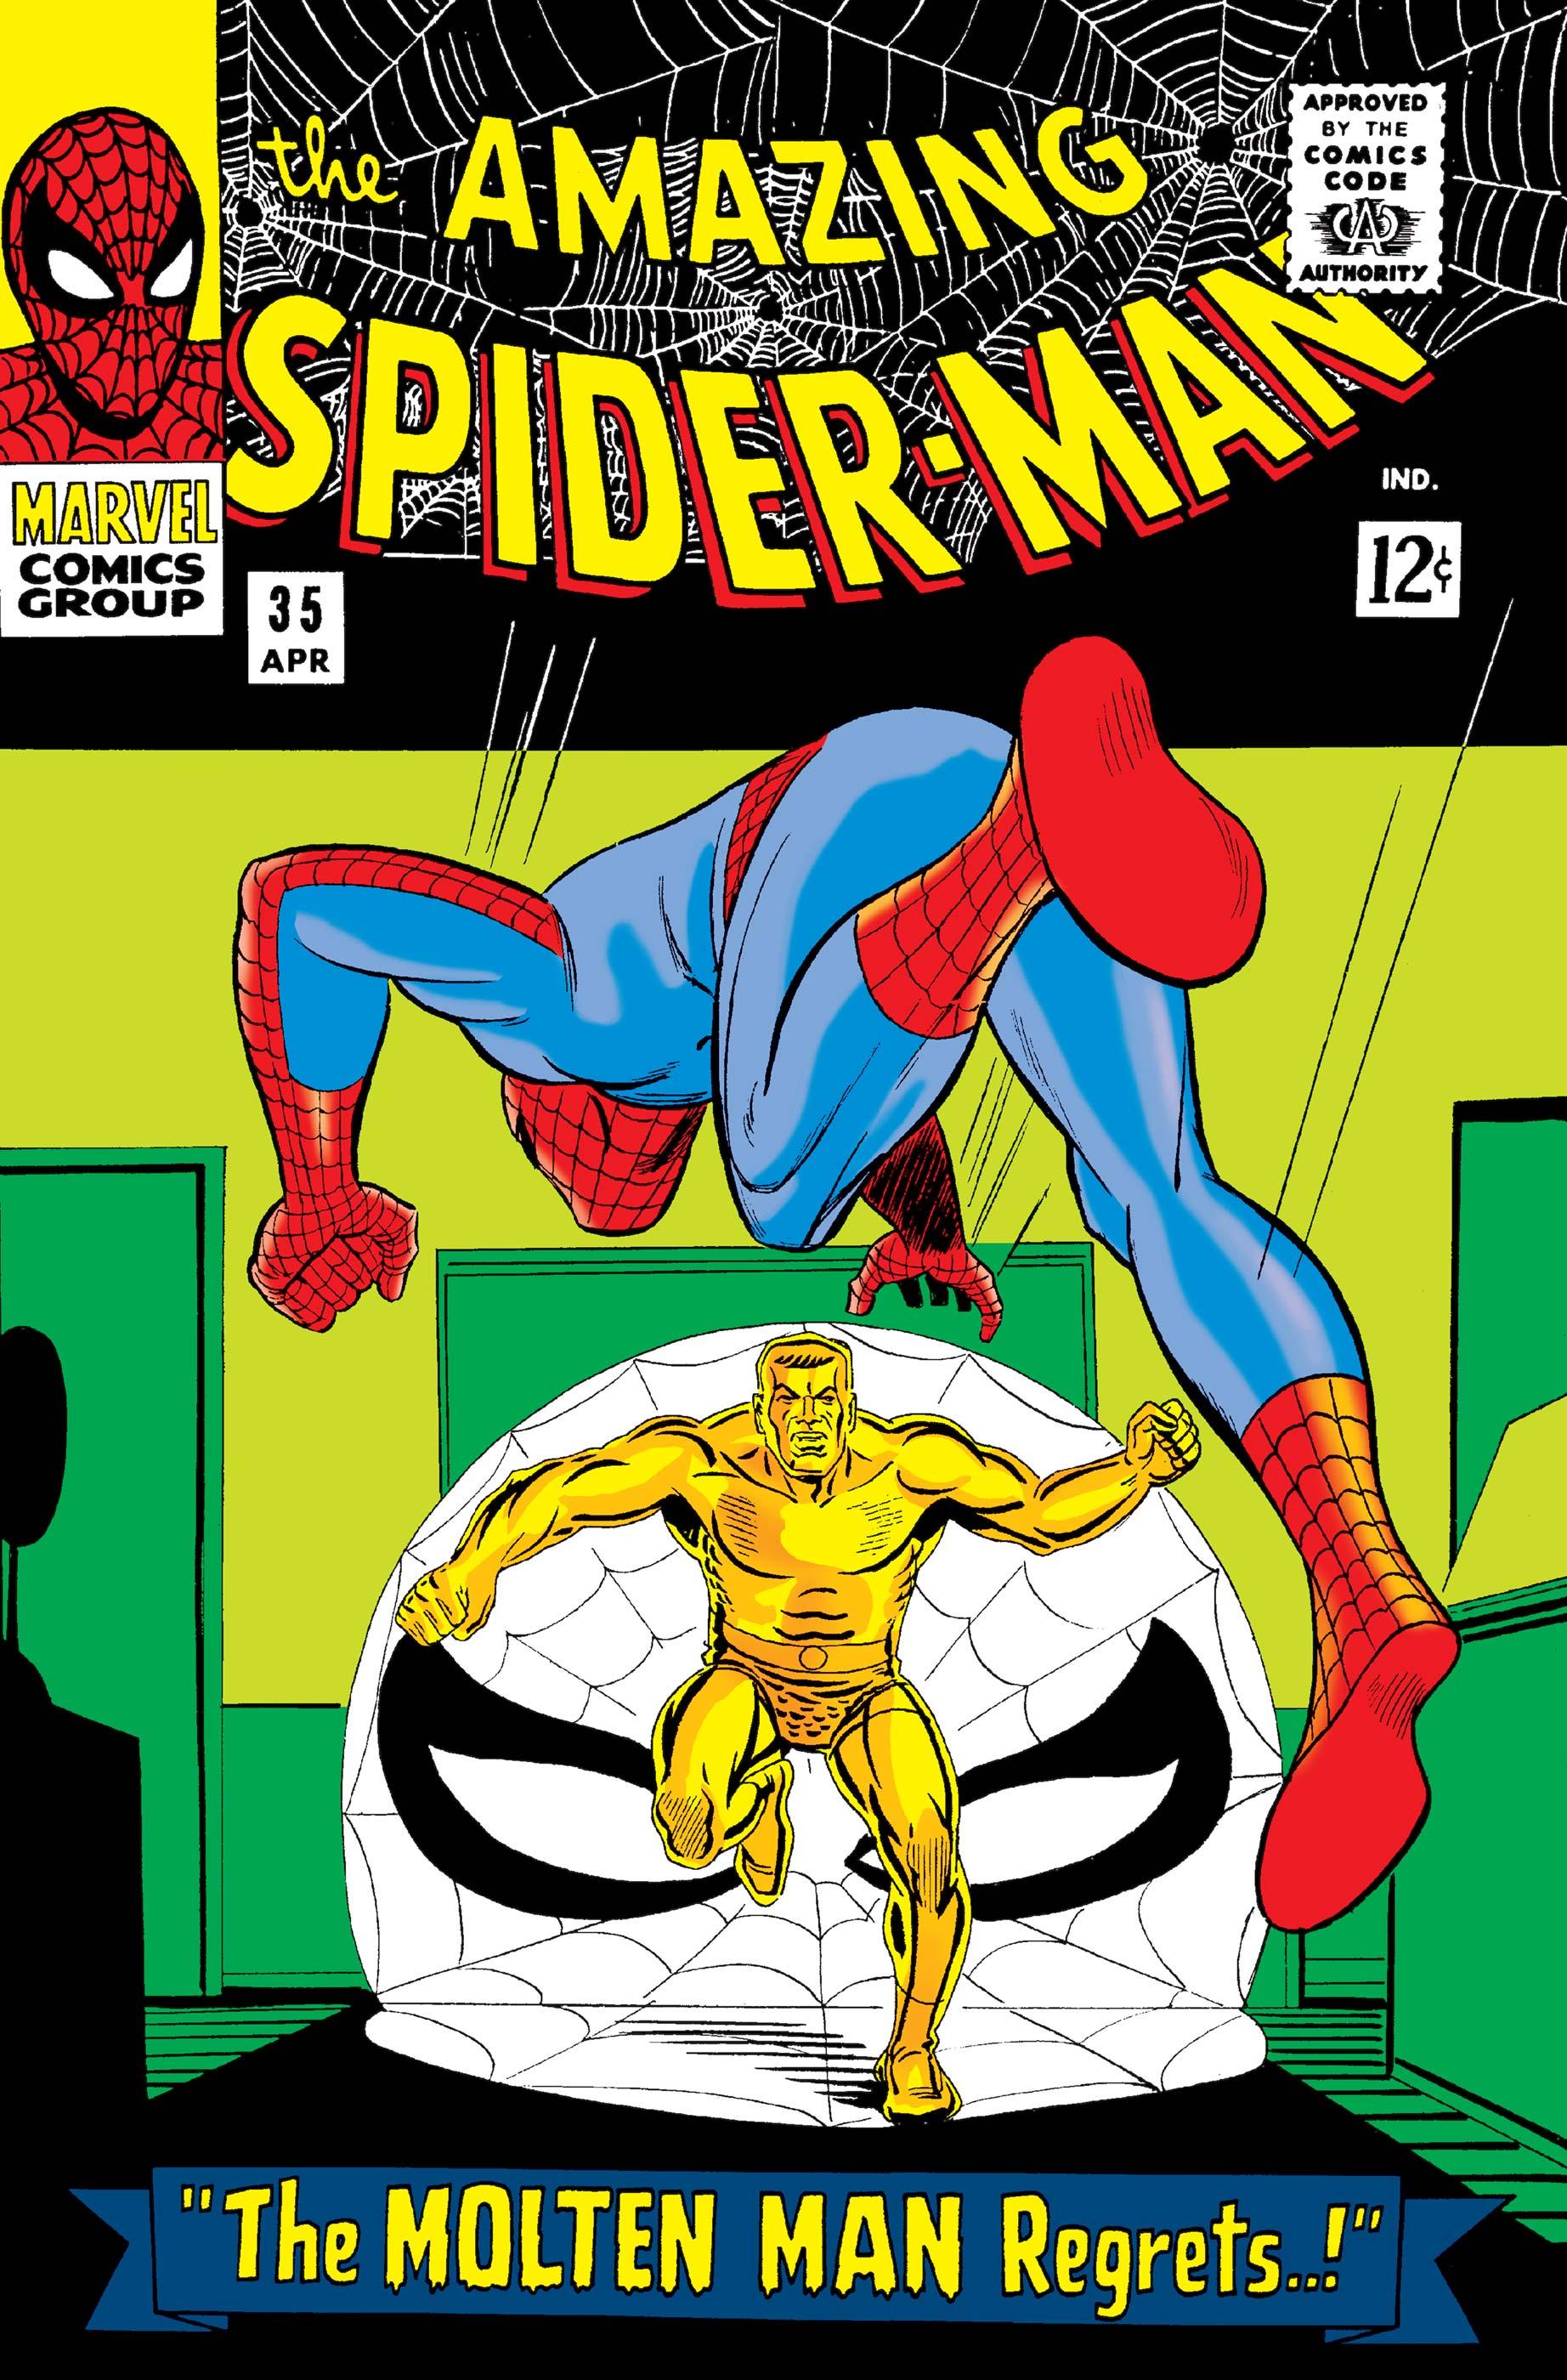 The Amazing Spider-Man (1963) #35